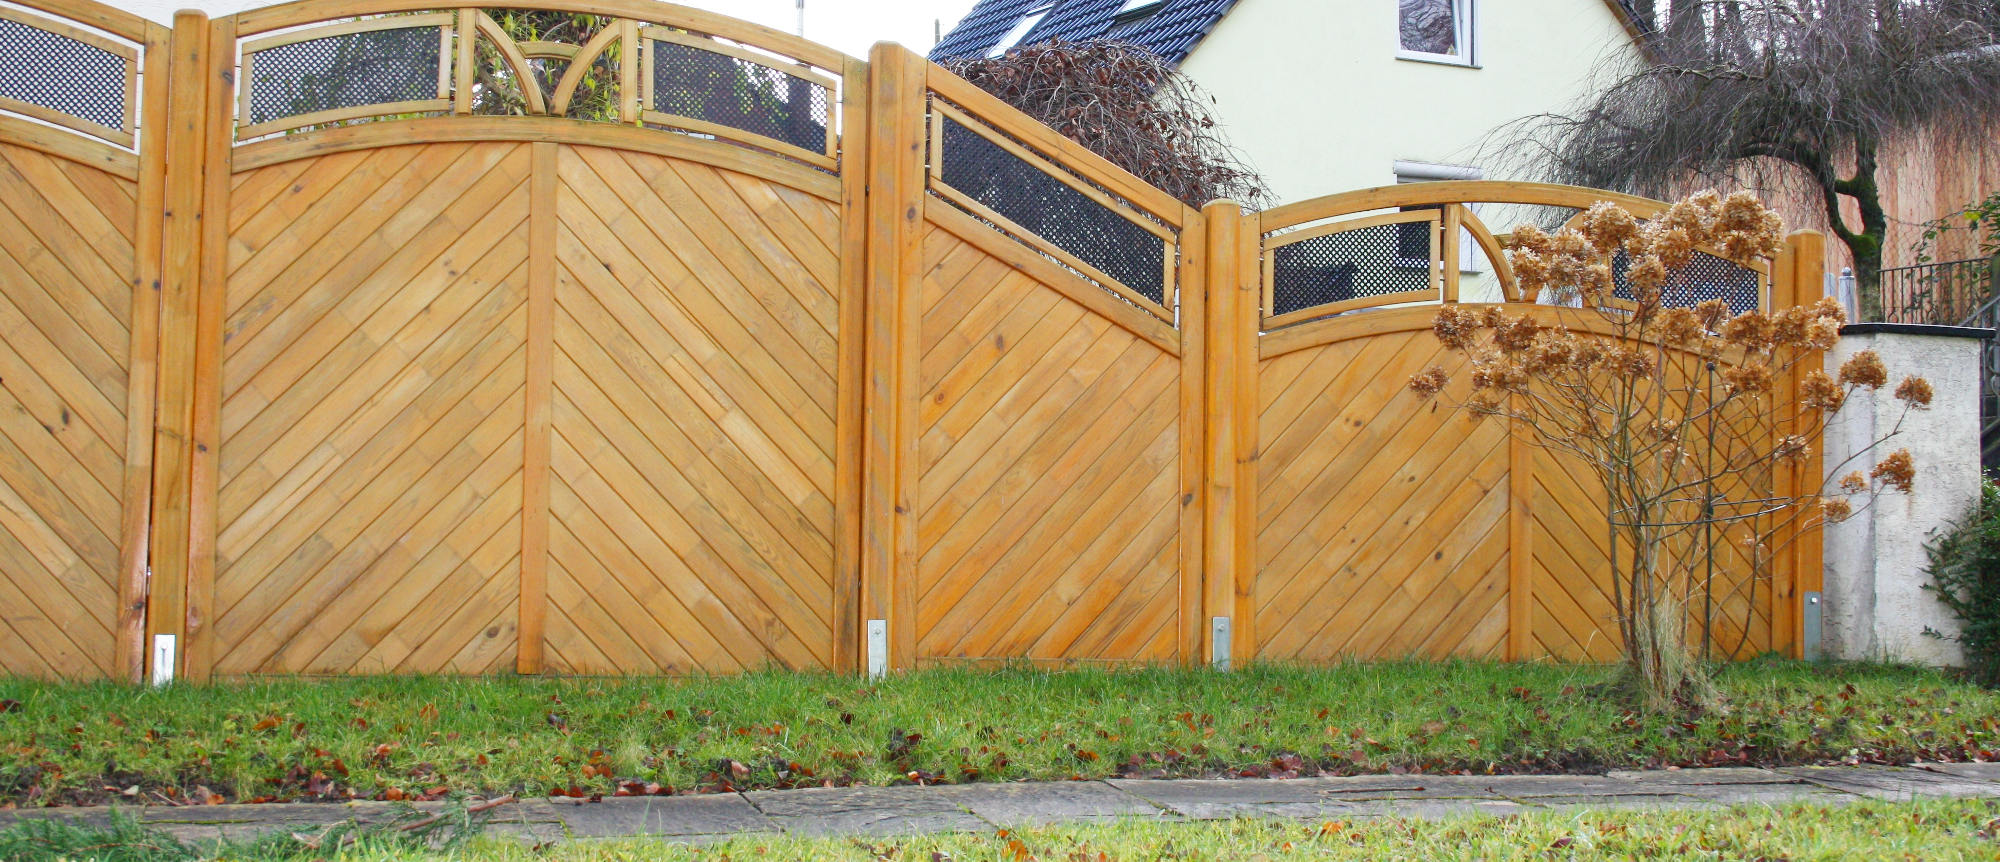 Zäune aus Holz richtig pflegen